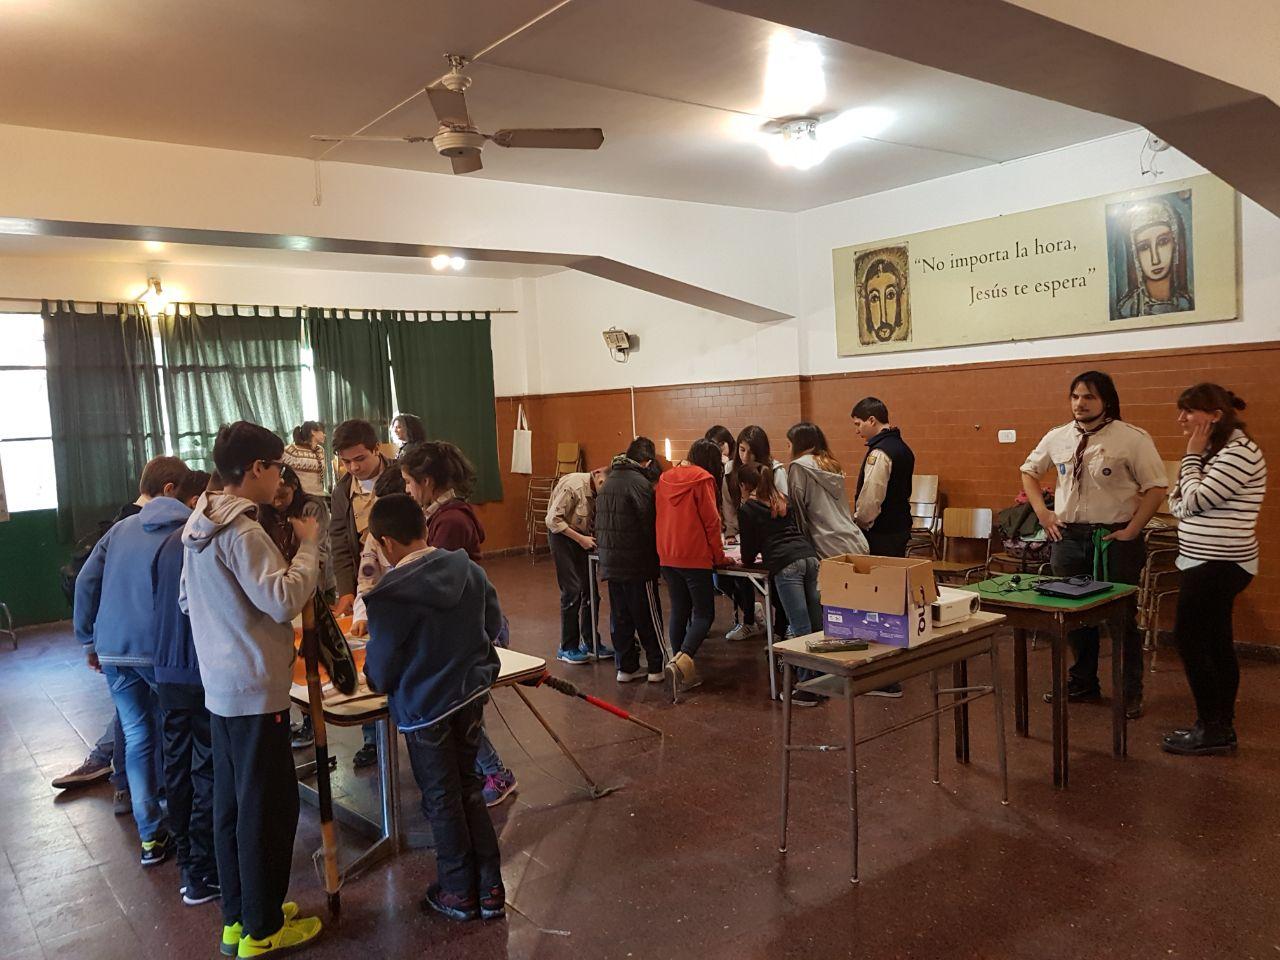 Grooming Argentina | Taller de Grooming | Socuts Grupo 236 Santa María